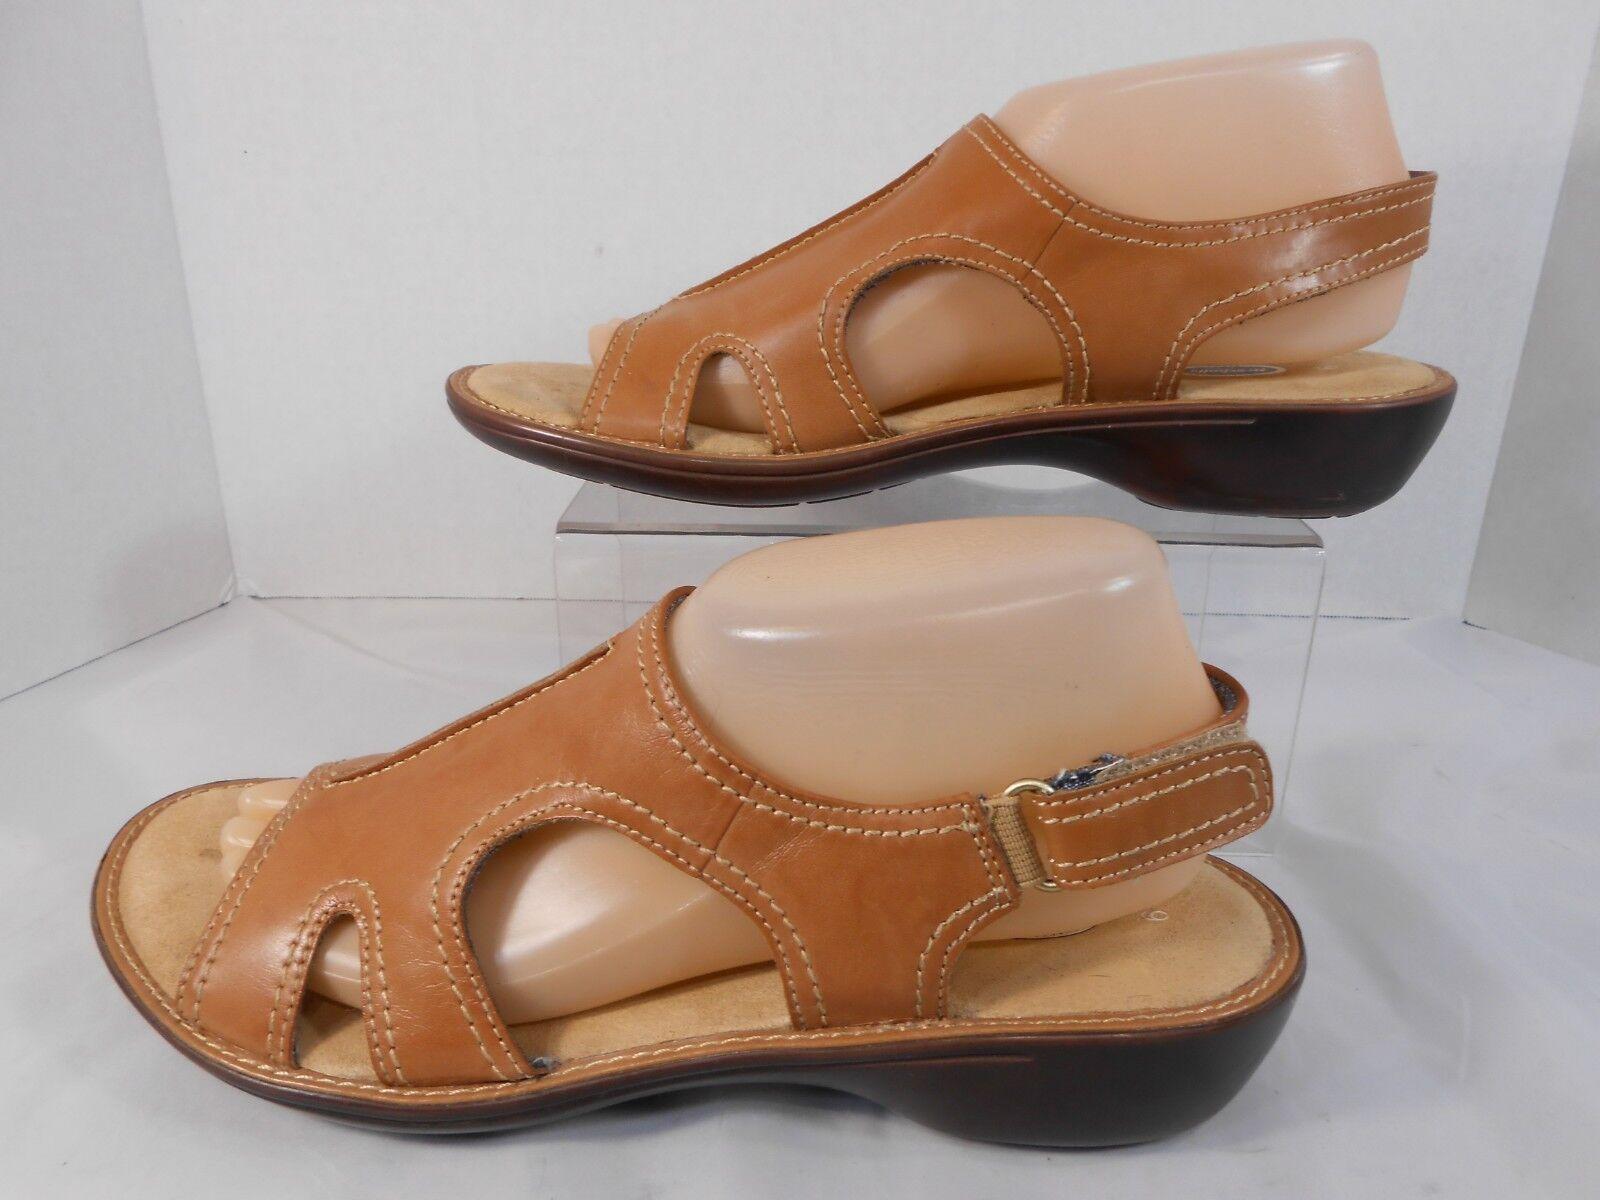 Dr Scholls Advanced Strappy Comfort Womens Size 9 Strappy Advanced Slingback Walking Sandals Tan b3c38b